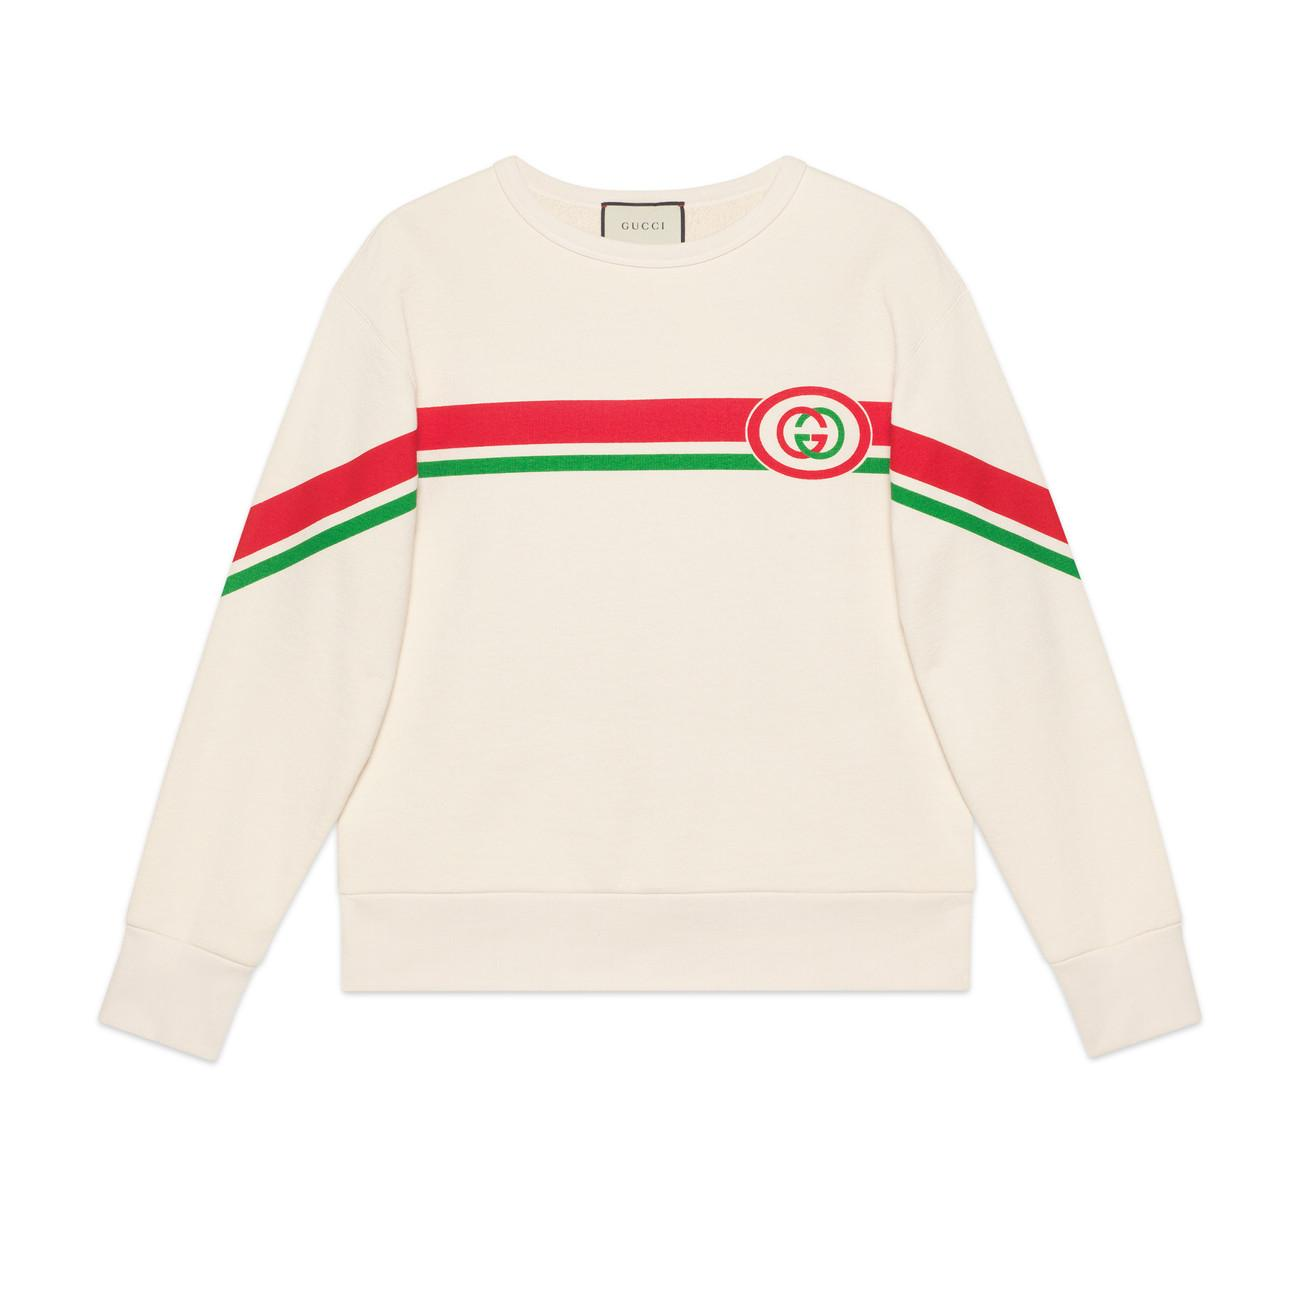 737920c8fb Lyst - Gucci Sweatshirt With Interlocking G Print in White for Men